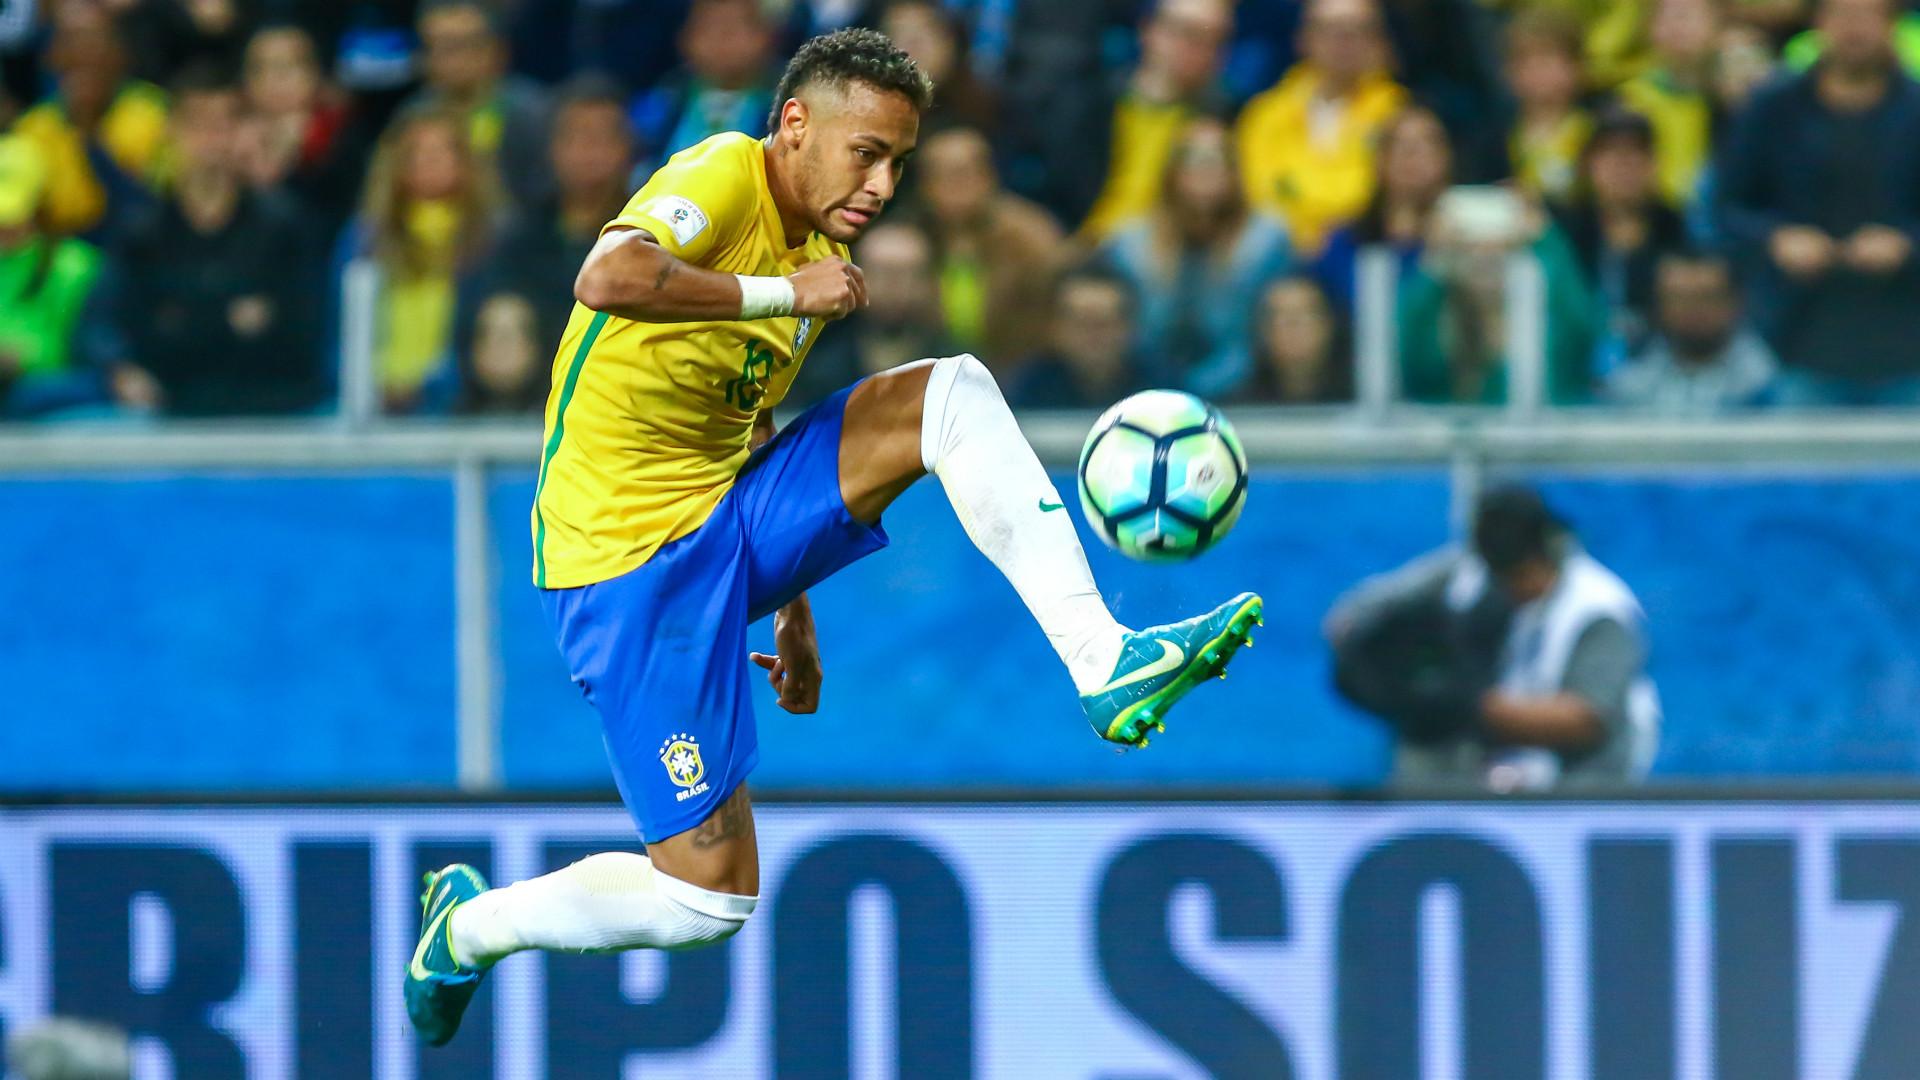 Neymar Wallpaper 2018